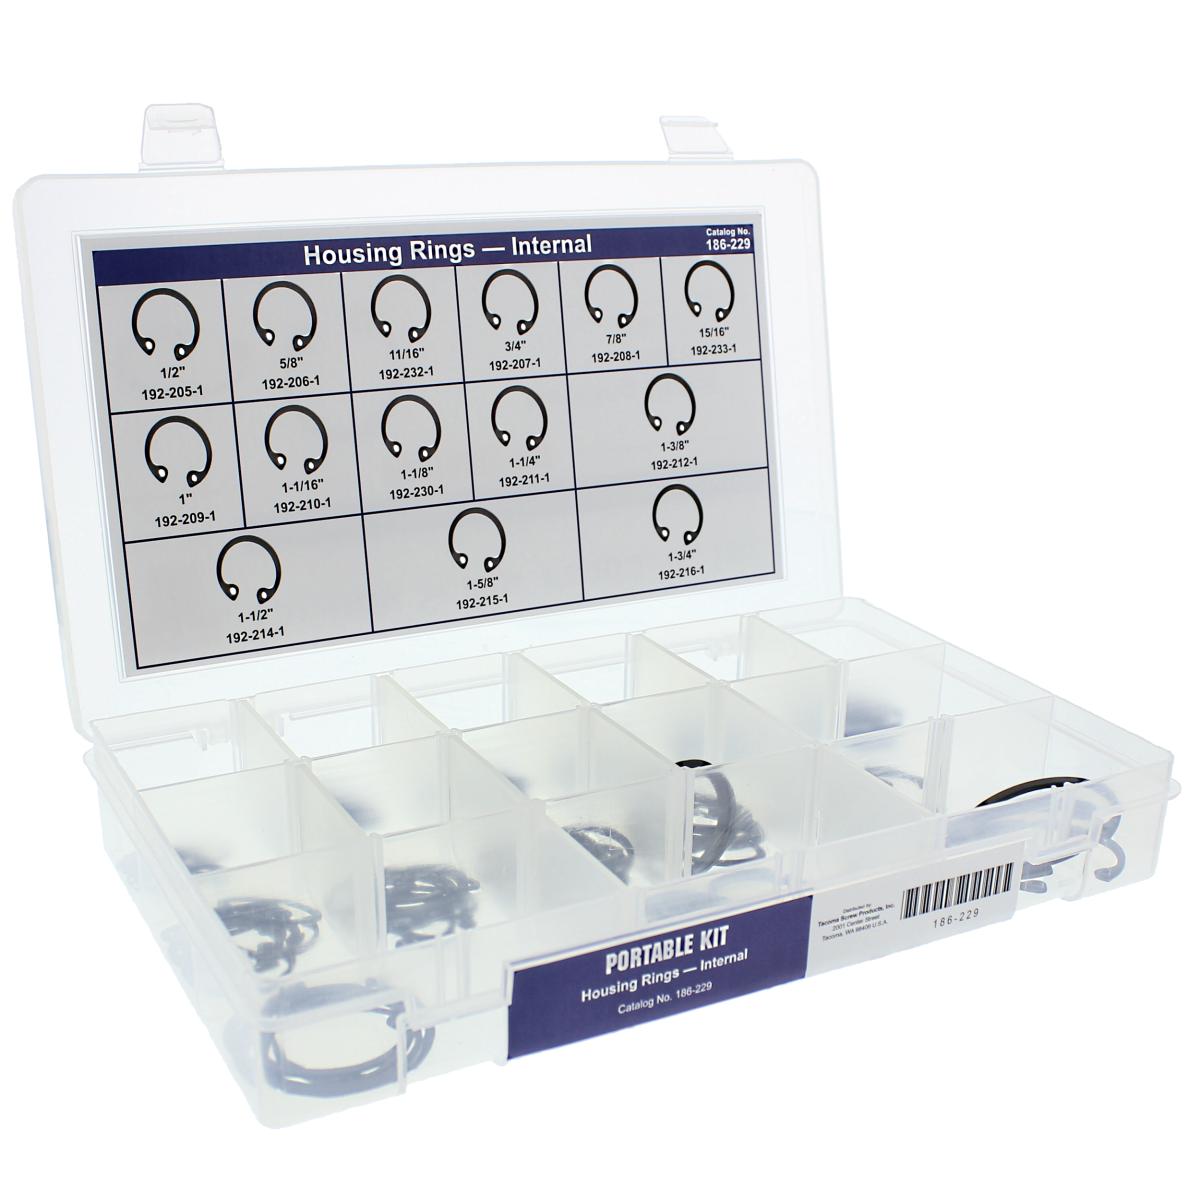 Housing Rings Portable Kit Assortment